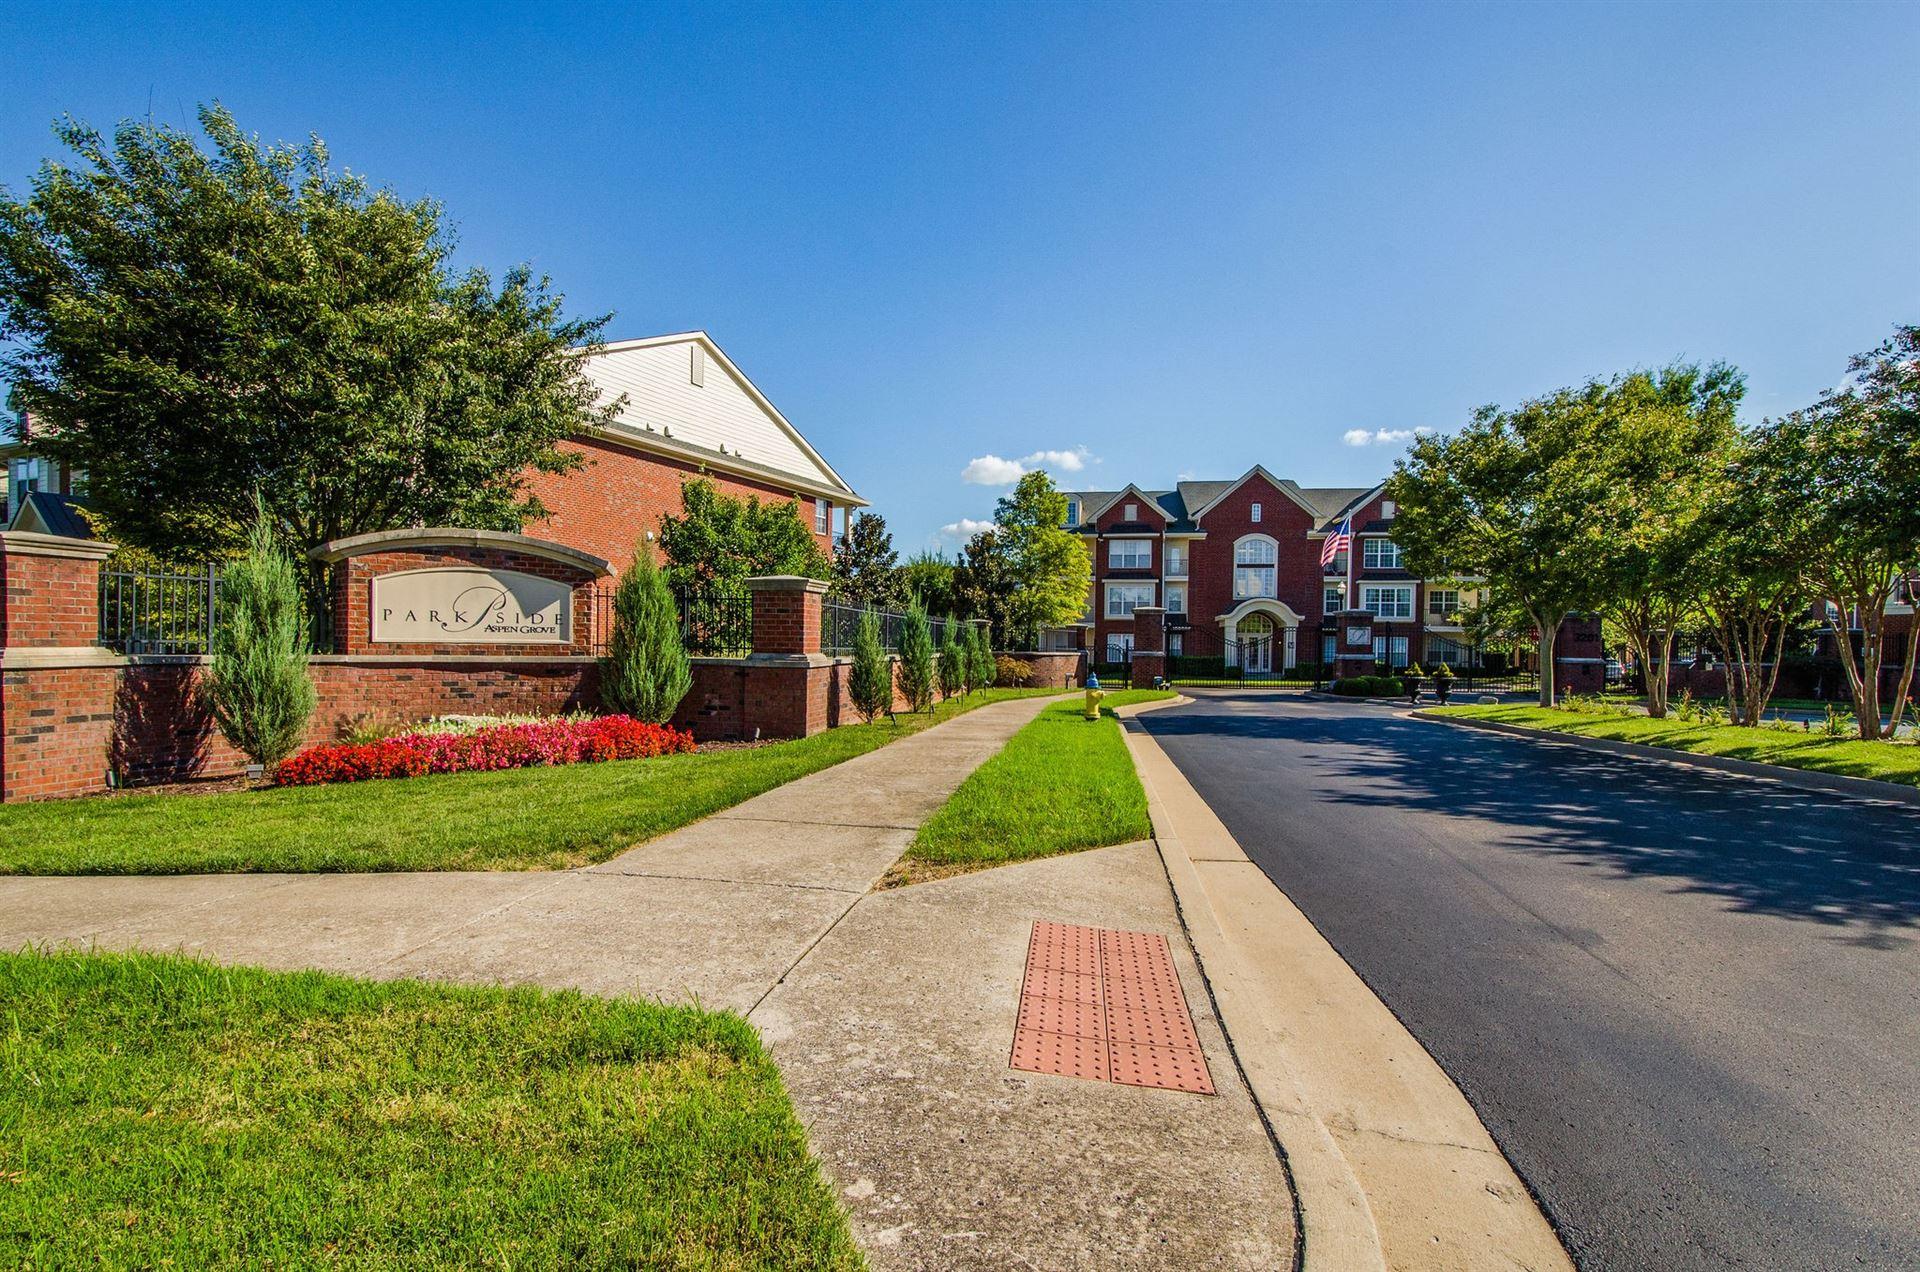 Photo of 3201 Aspen Grove Dr #C4, Franklin, TN 37067 (MLS # 2140282)